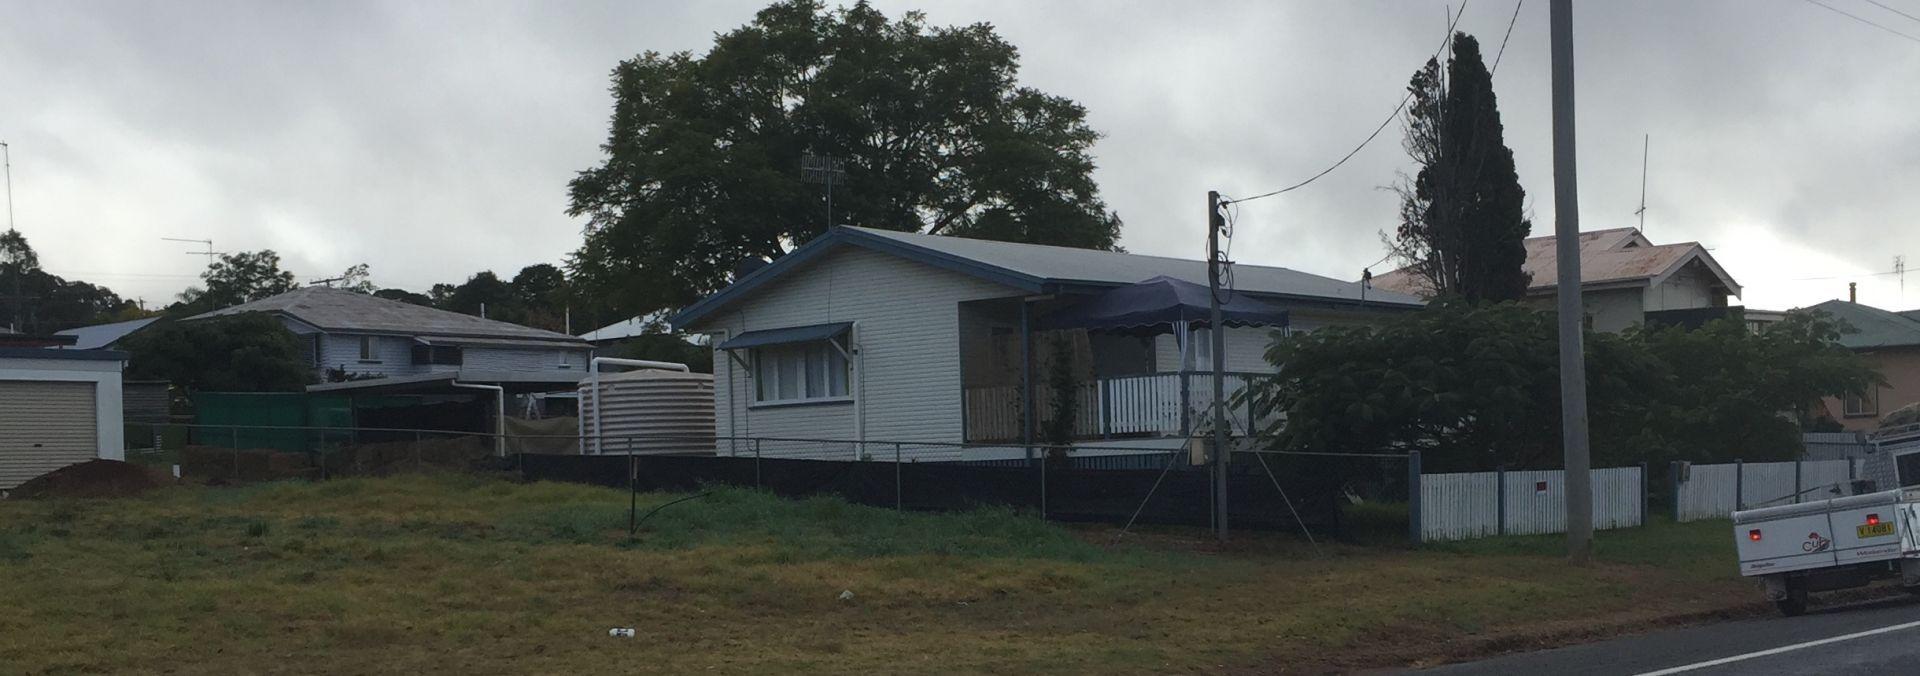 25 Margaret St, Yarraman QLD 4614, Image 1